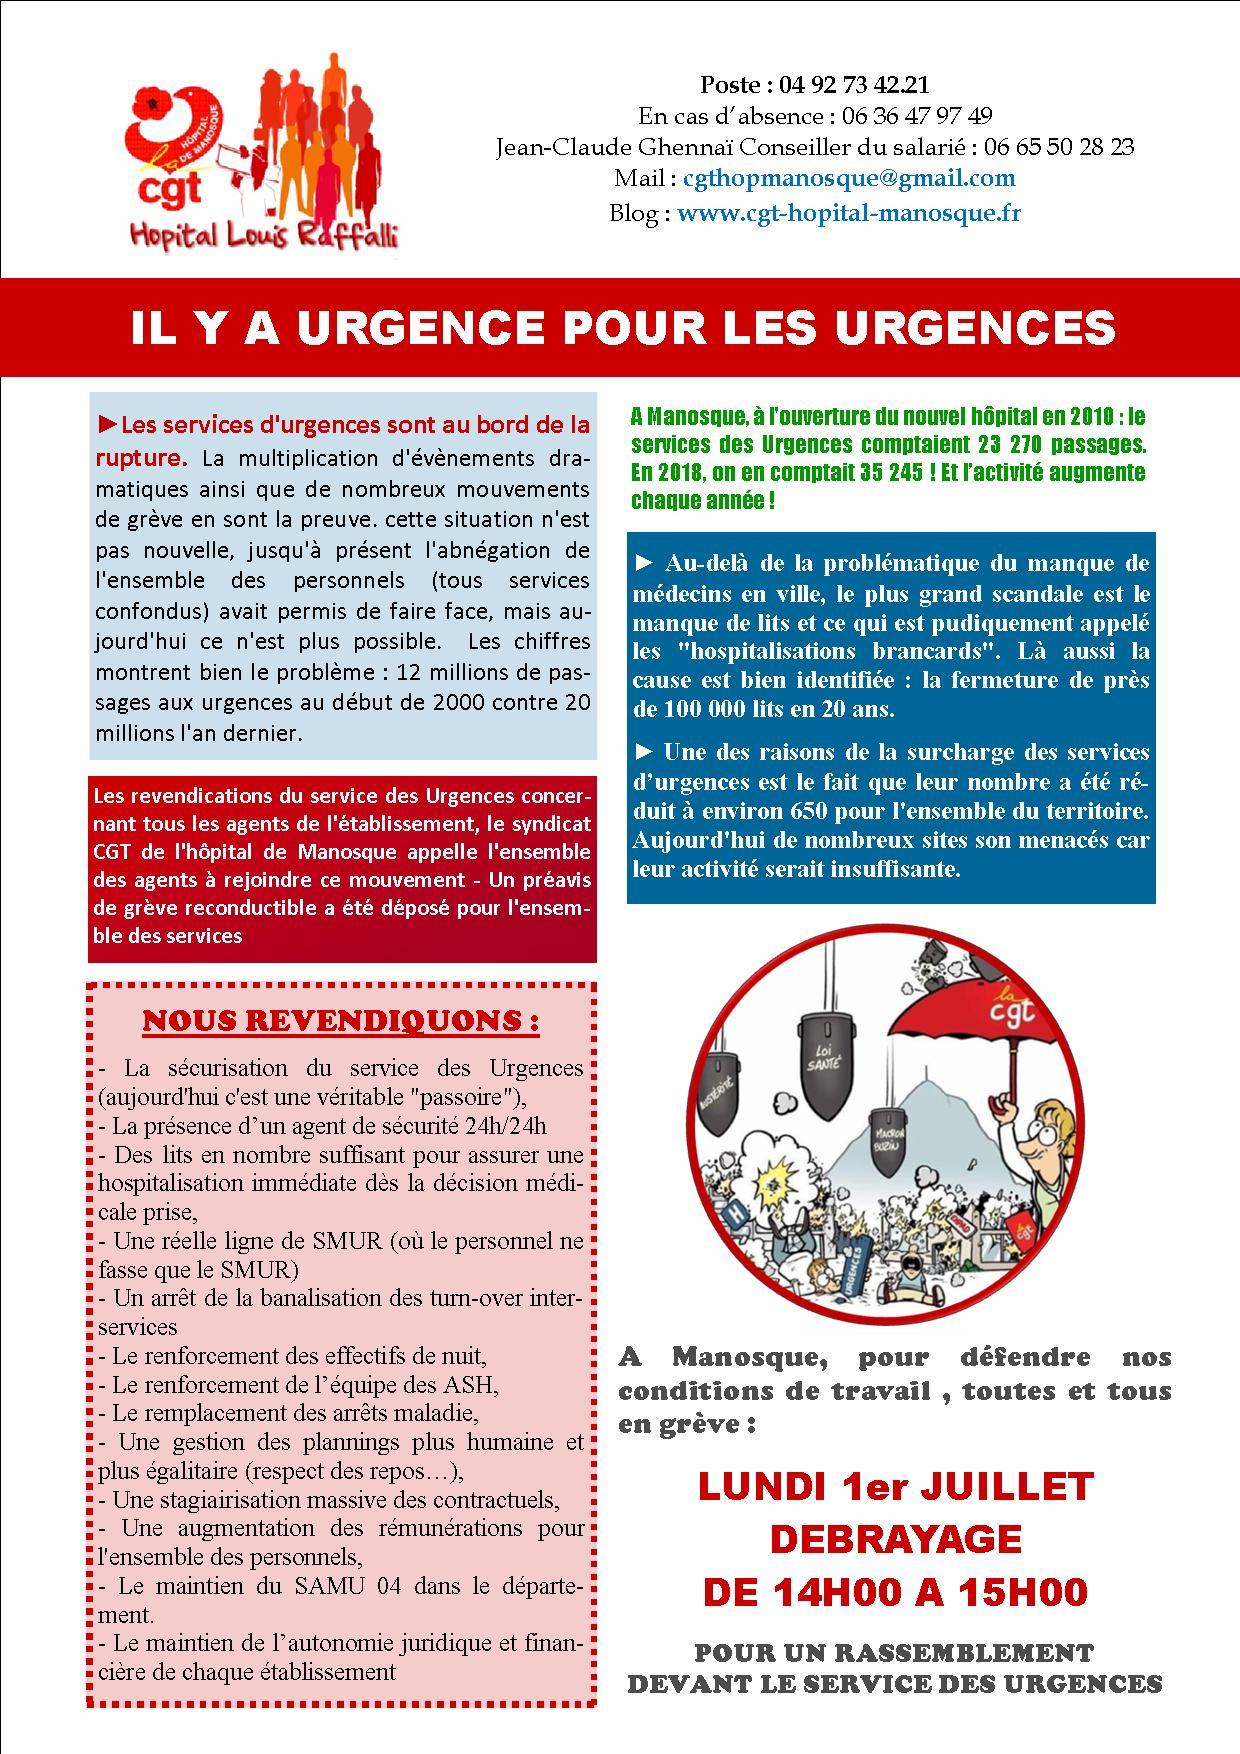 Tract 1 grève urgences hôpital Manosque